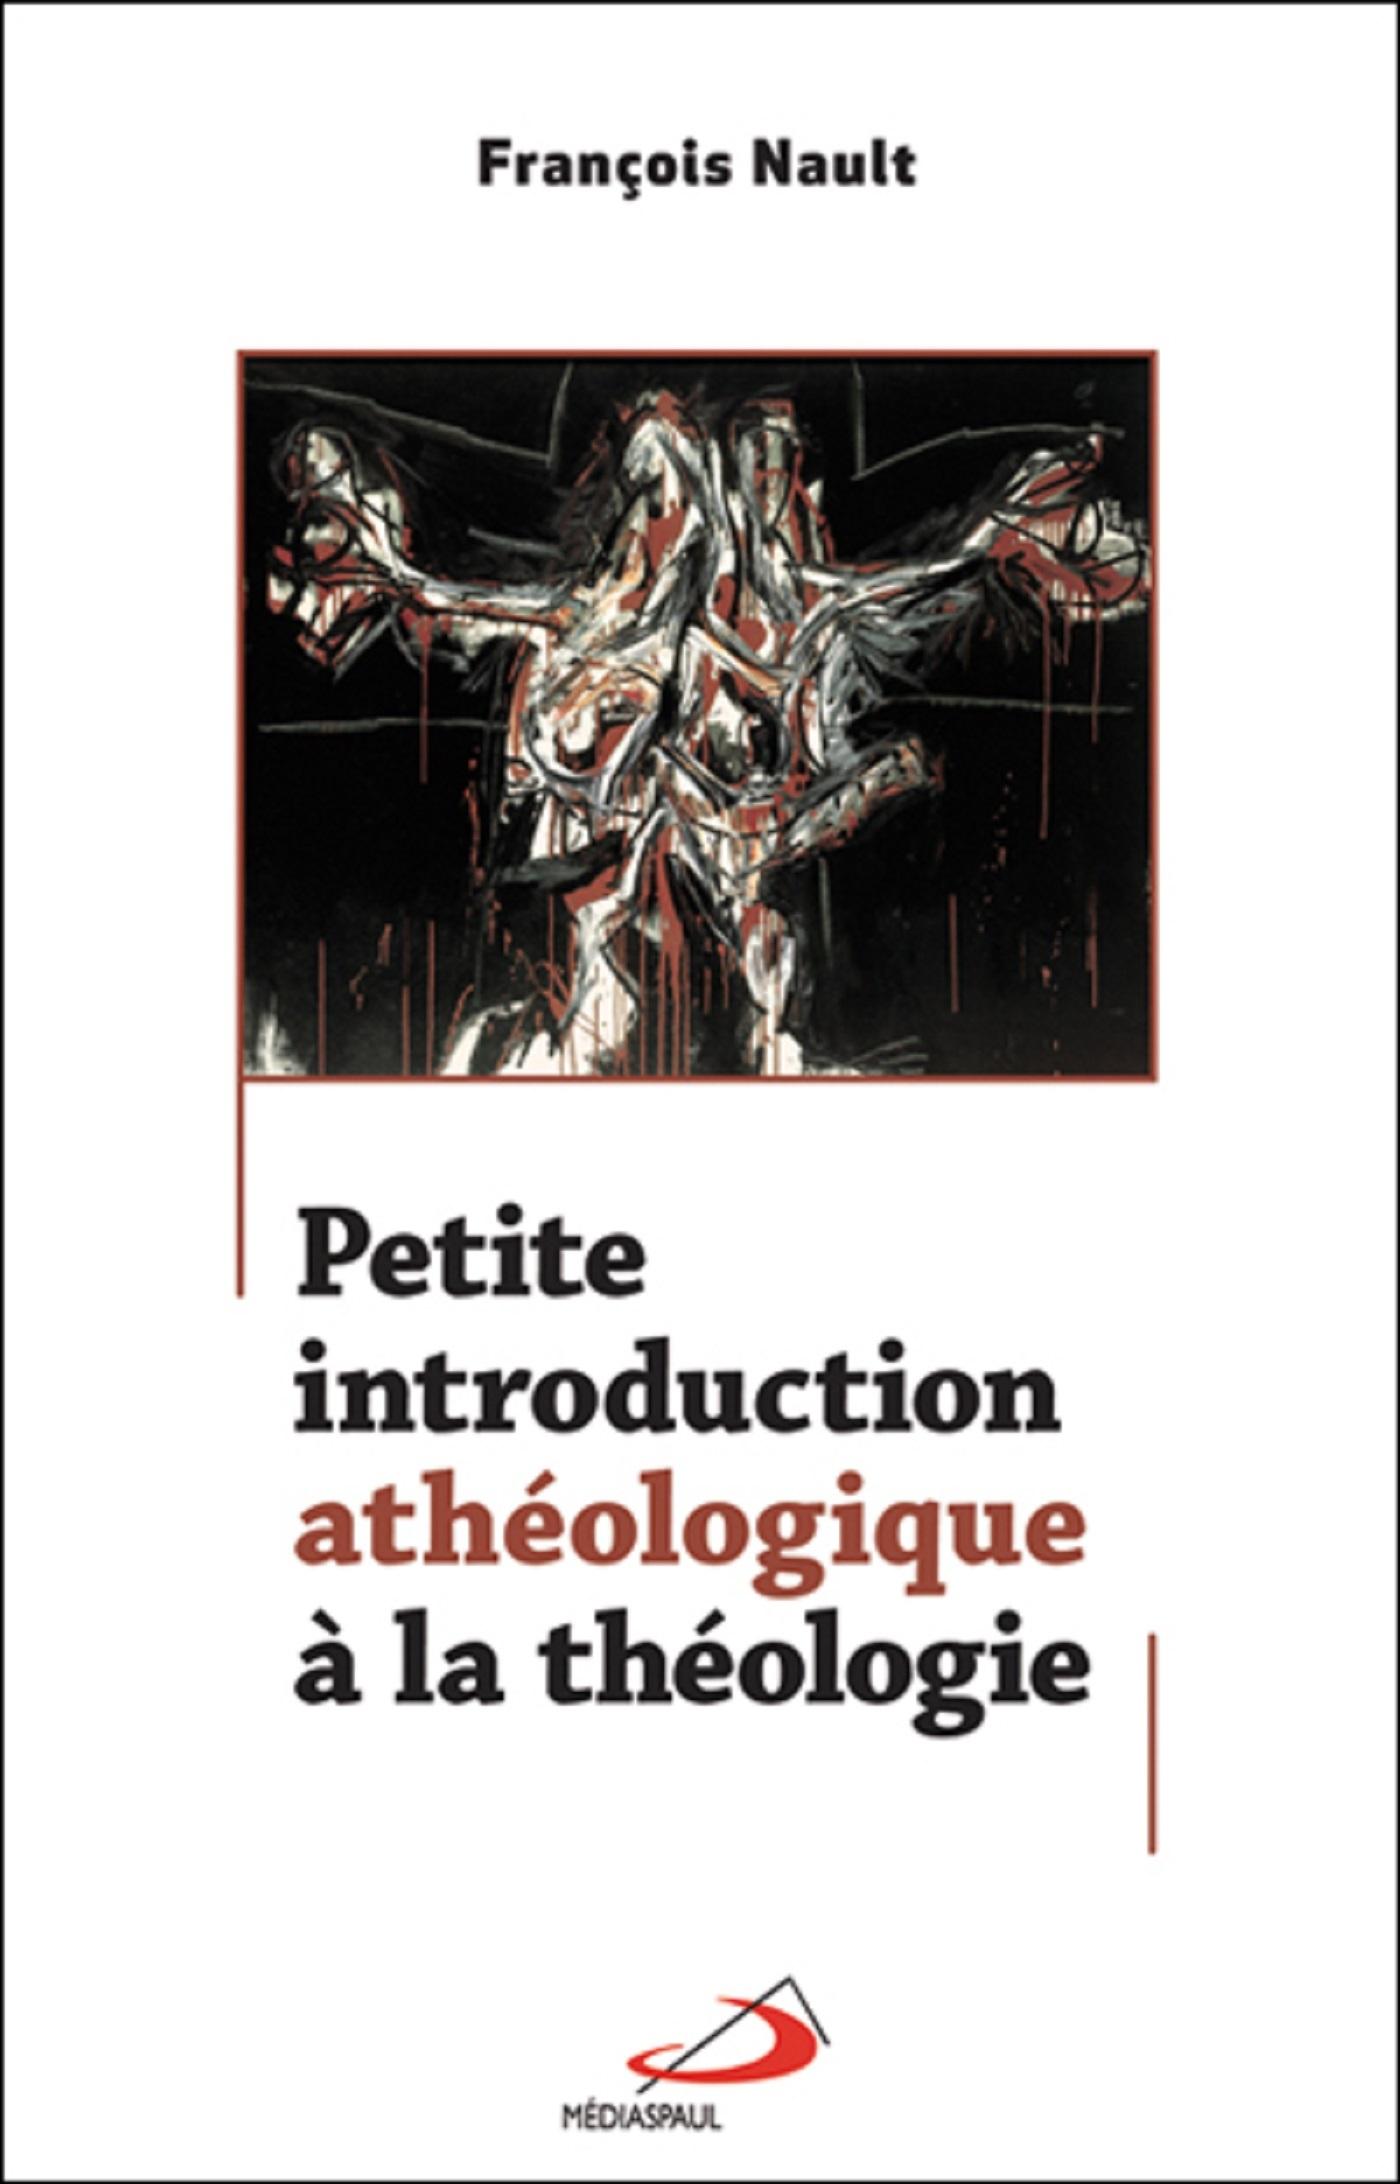 PETITE INTRODUCTION ATHEOLOGIQUE A LA THEOLOGIE